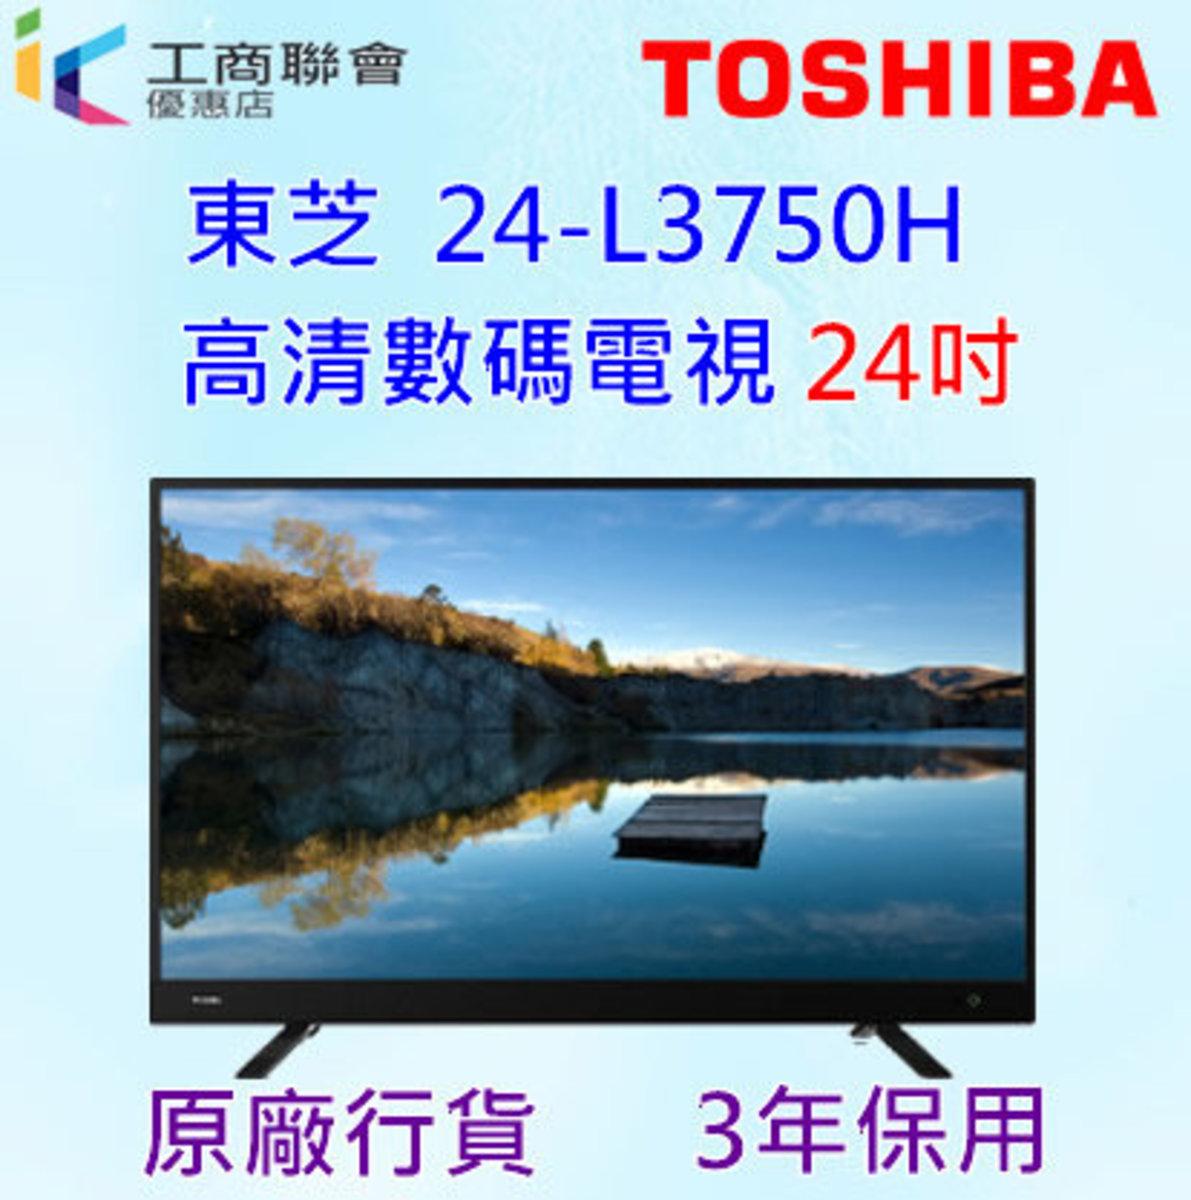 24L3750H HD Digital TV 24 inches (3-year licensed warranty)